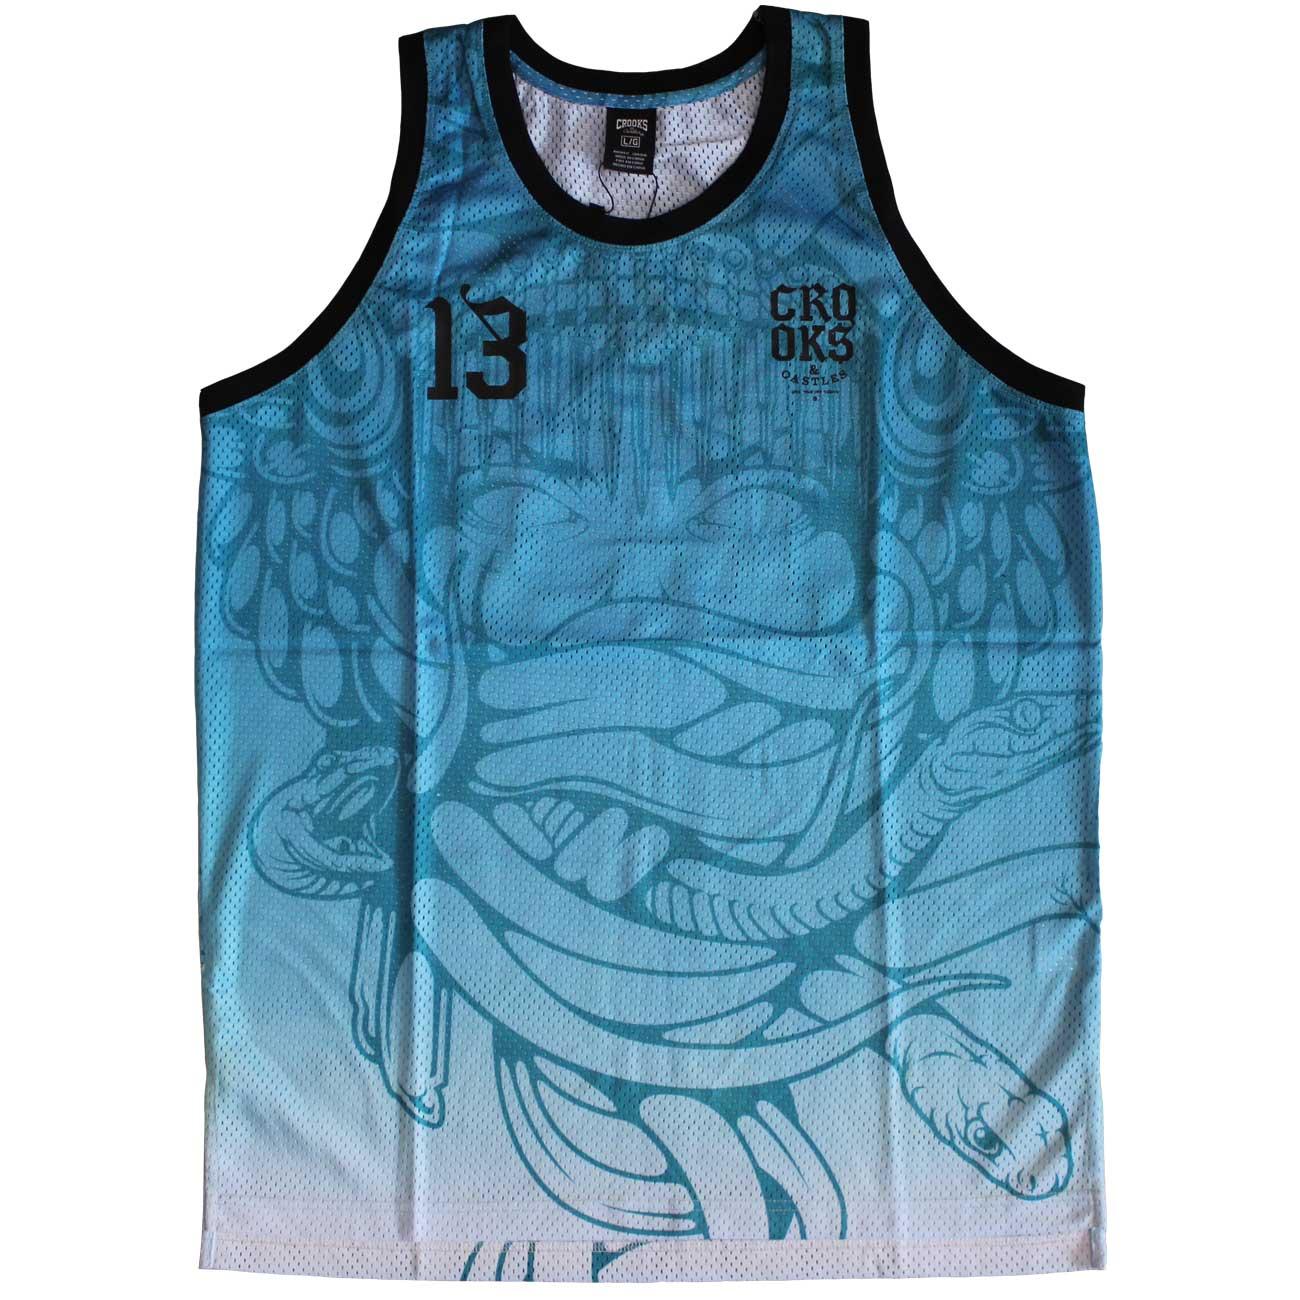 Crooks & Castles Trece Basketball Jersey Tank Top Blue